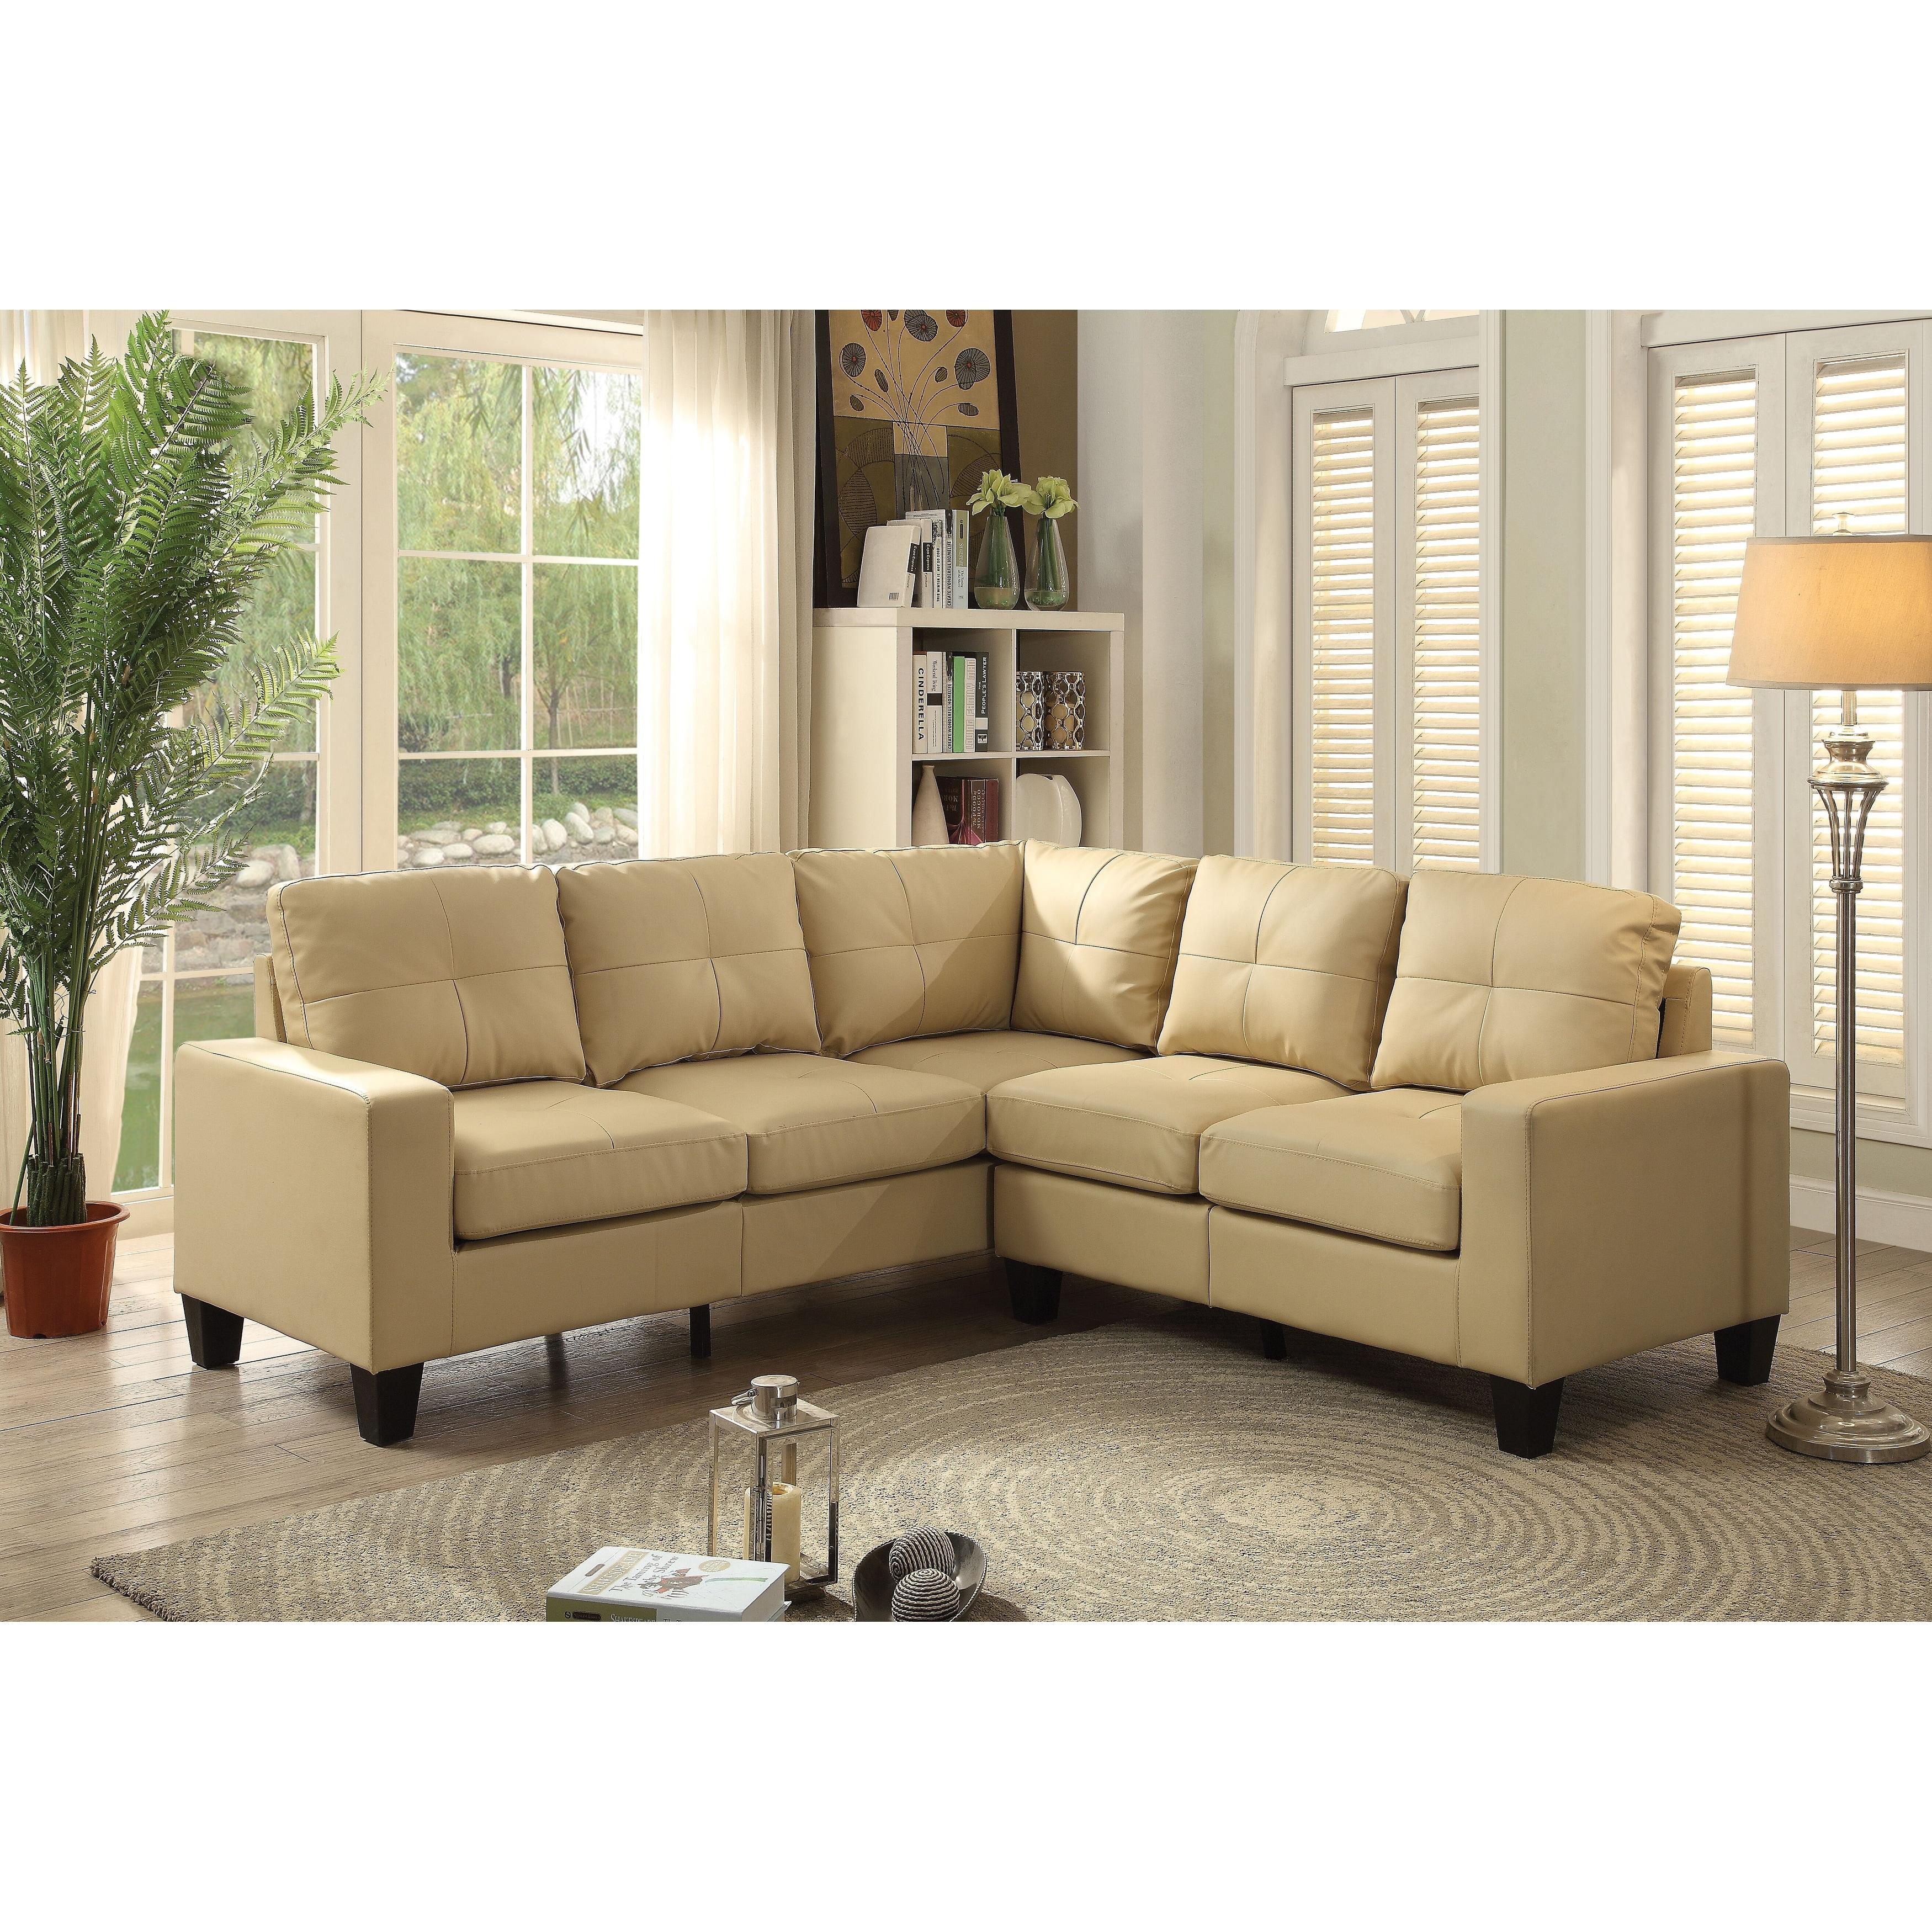 Newbury Faux Leather Sectional Sofa